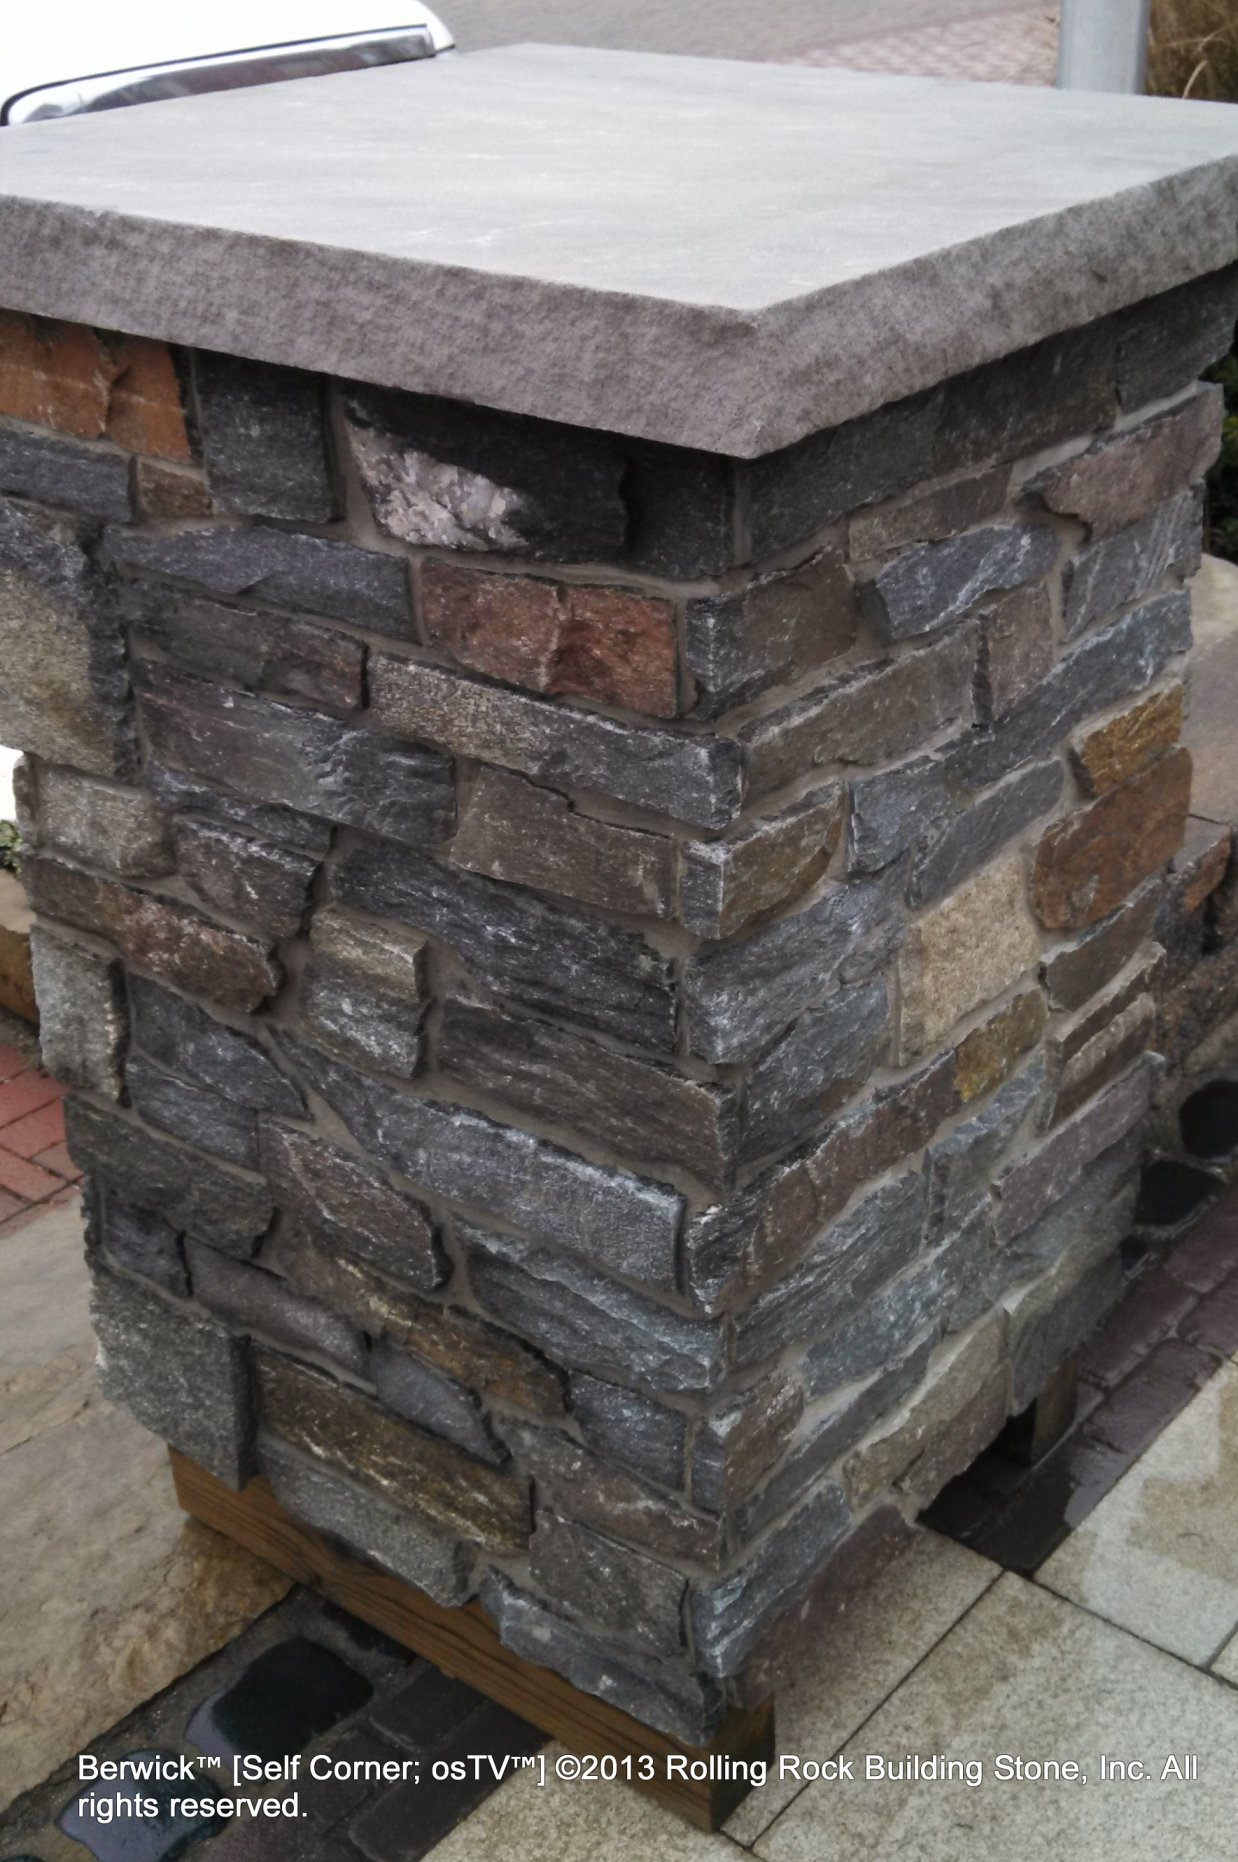 Building Stone Veneer : Berwick™ rolling rock building stone inc